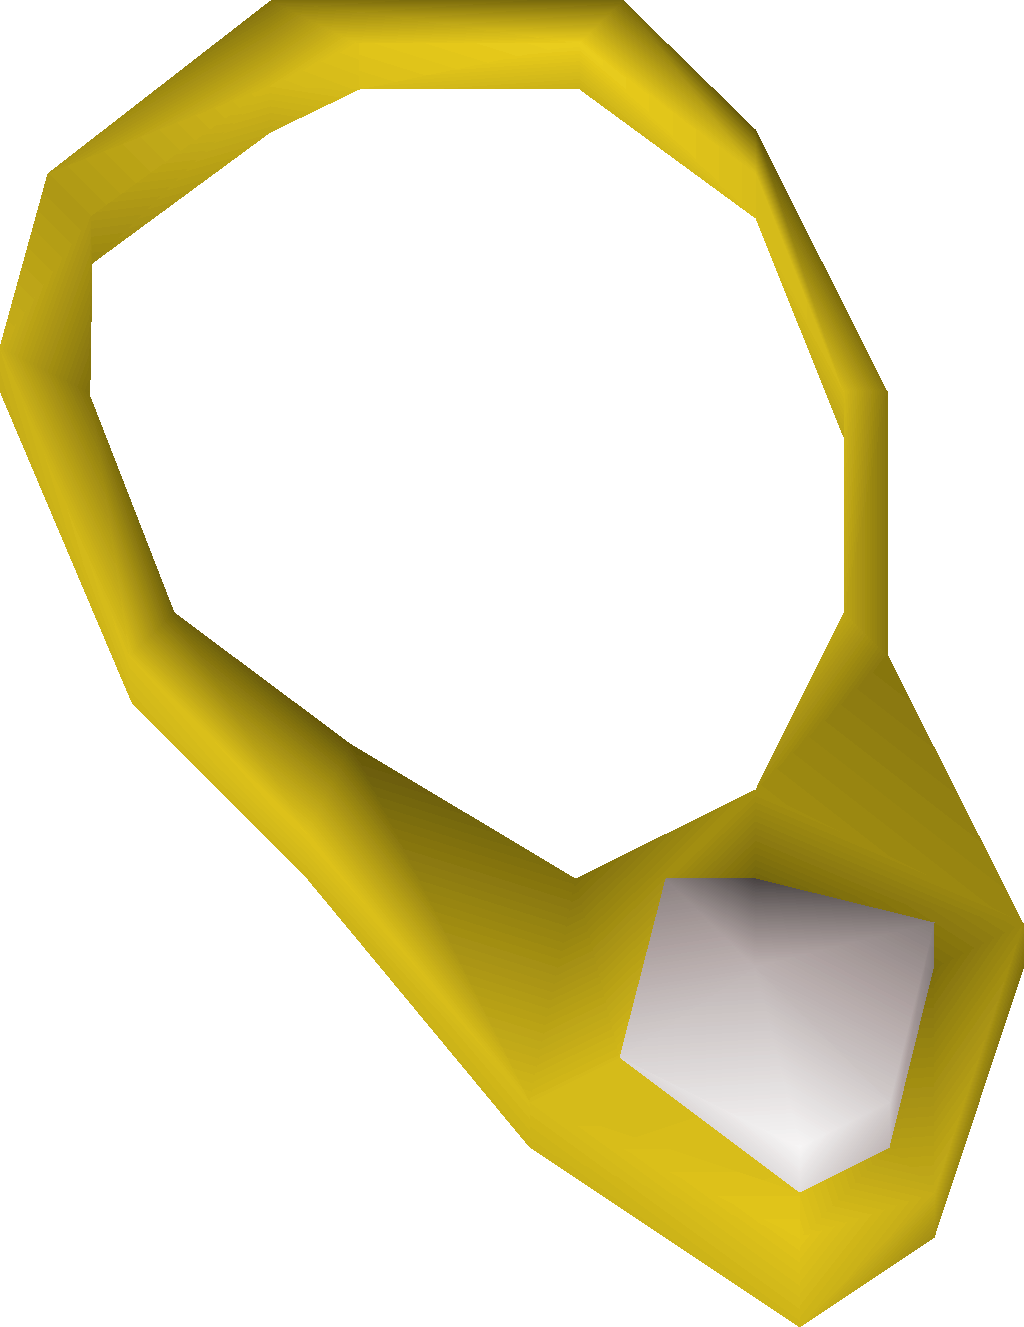 Diamond Jewelry Osrs : diamond, jewelry, Crafting, Diamond, Jewellery